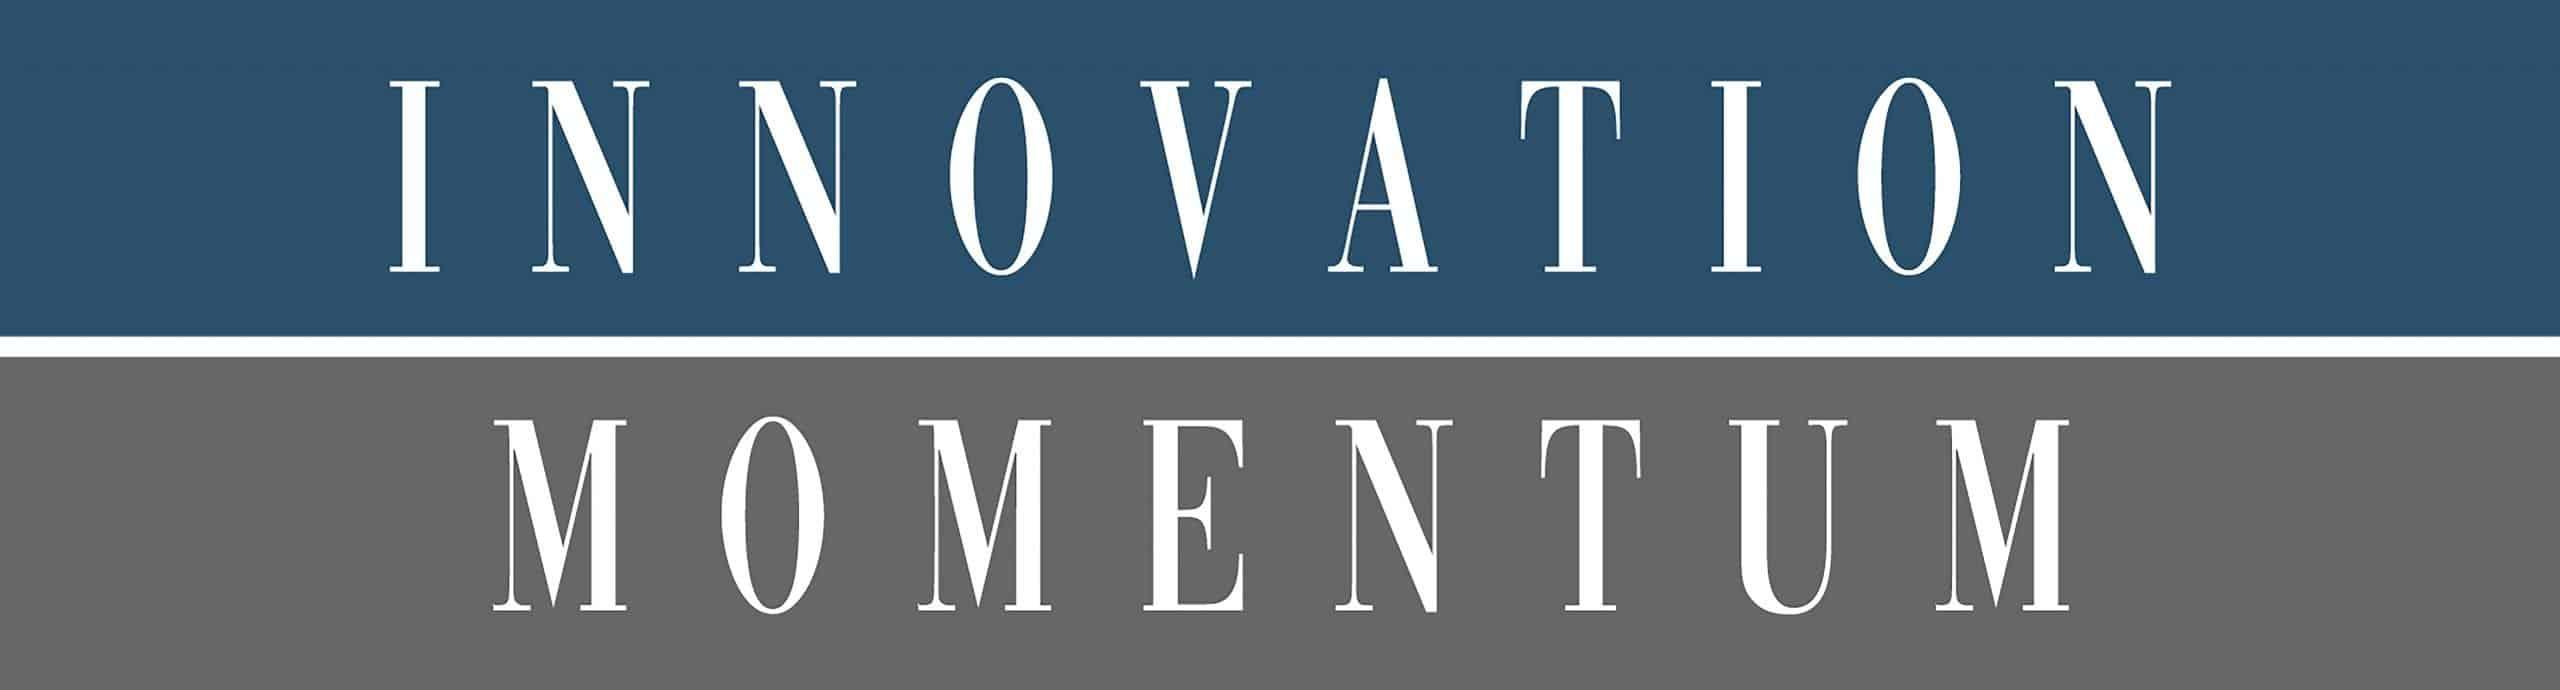 Innovation Momentum